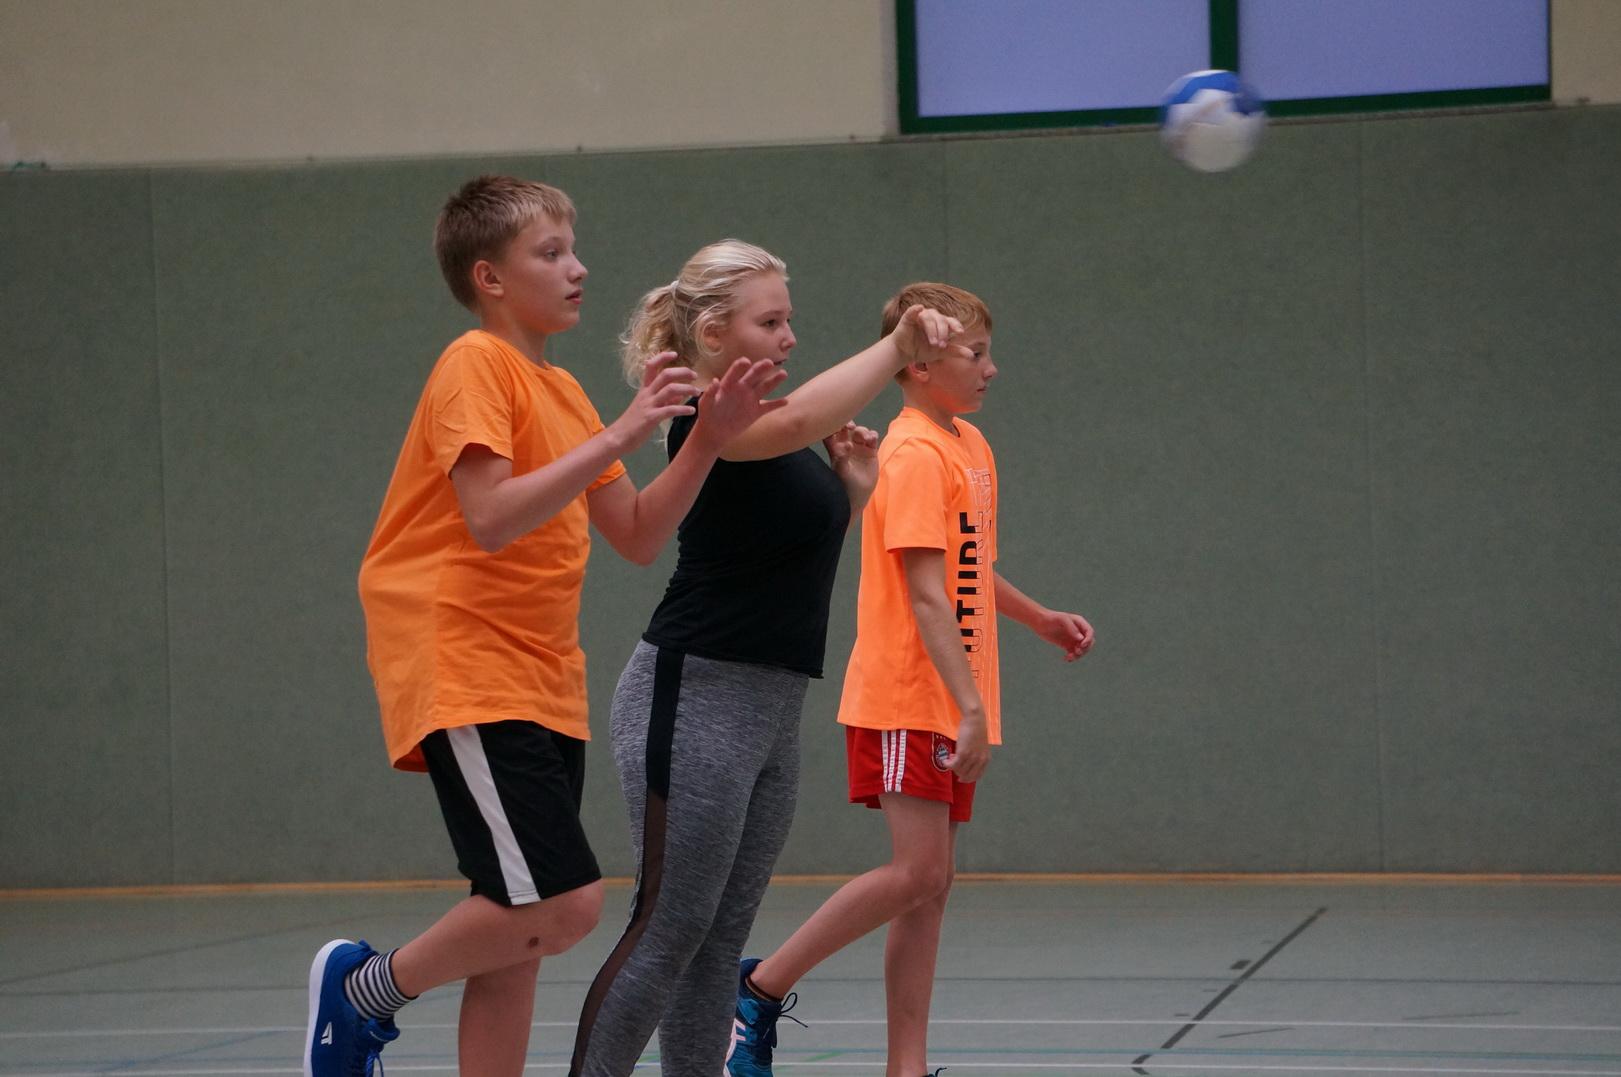 201808_Handballcamp_SDH_MG_167w